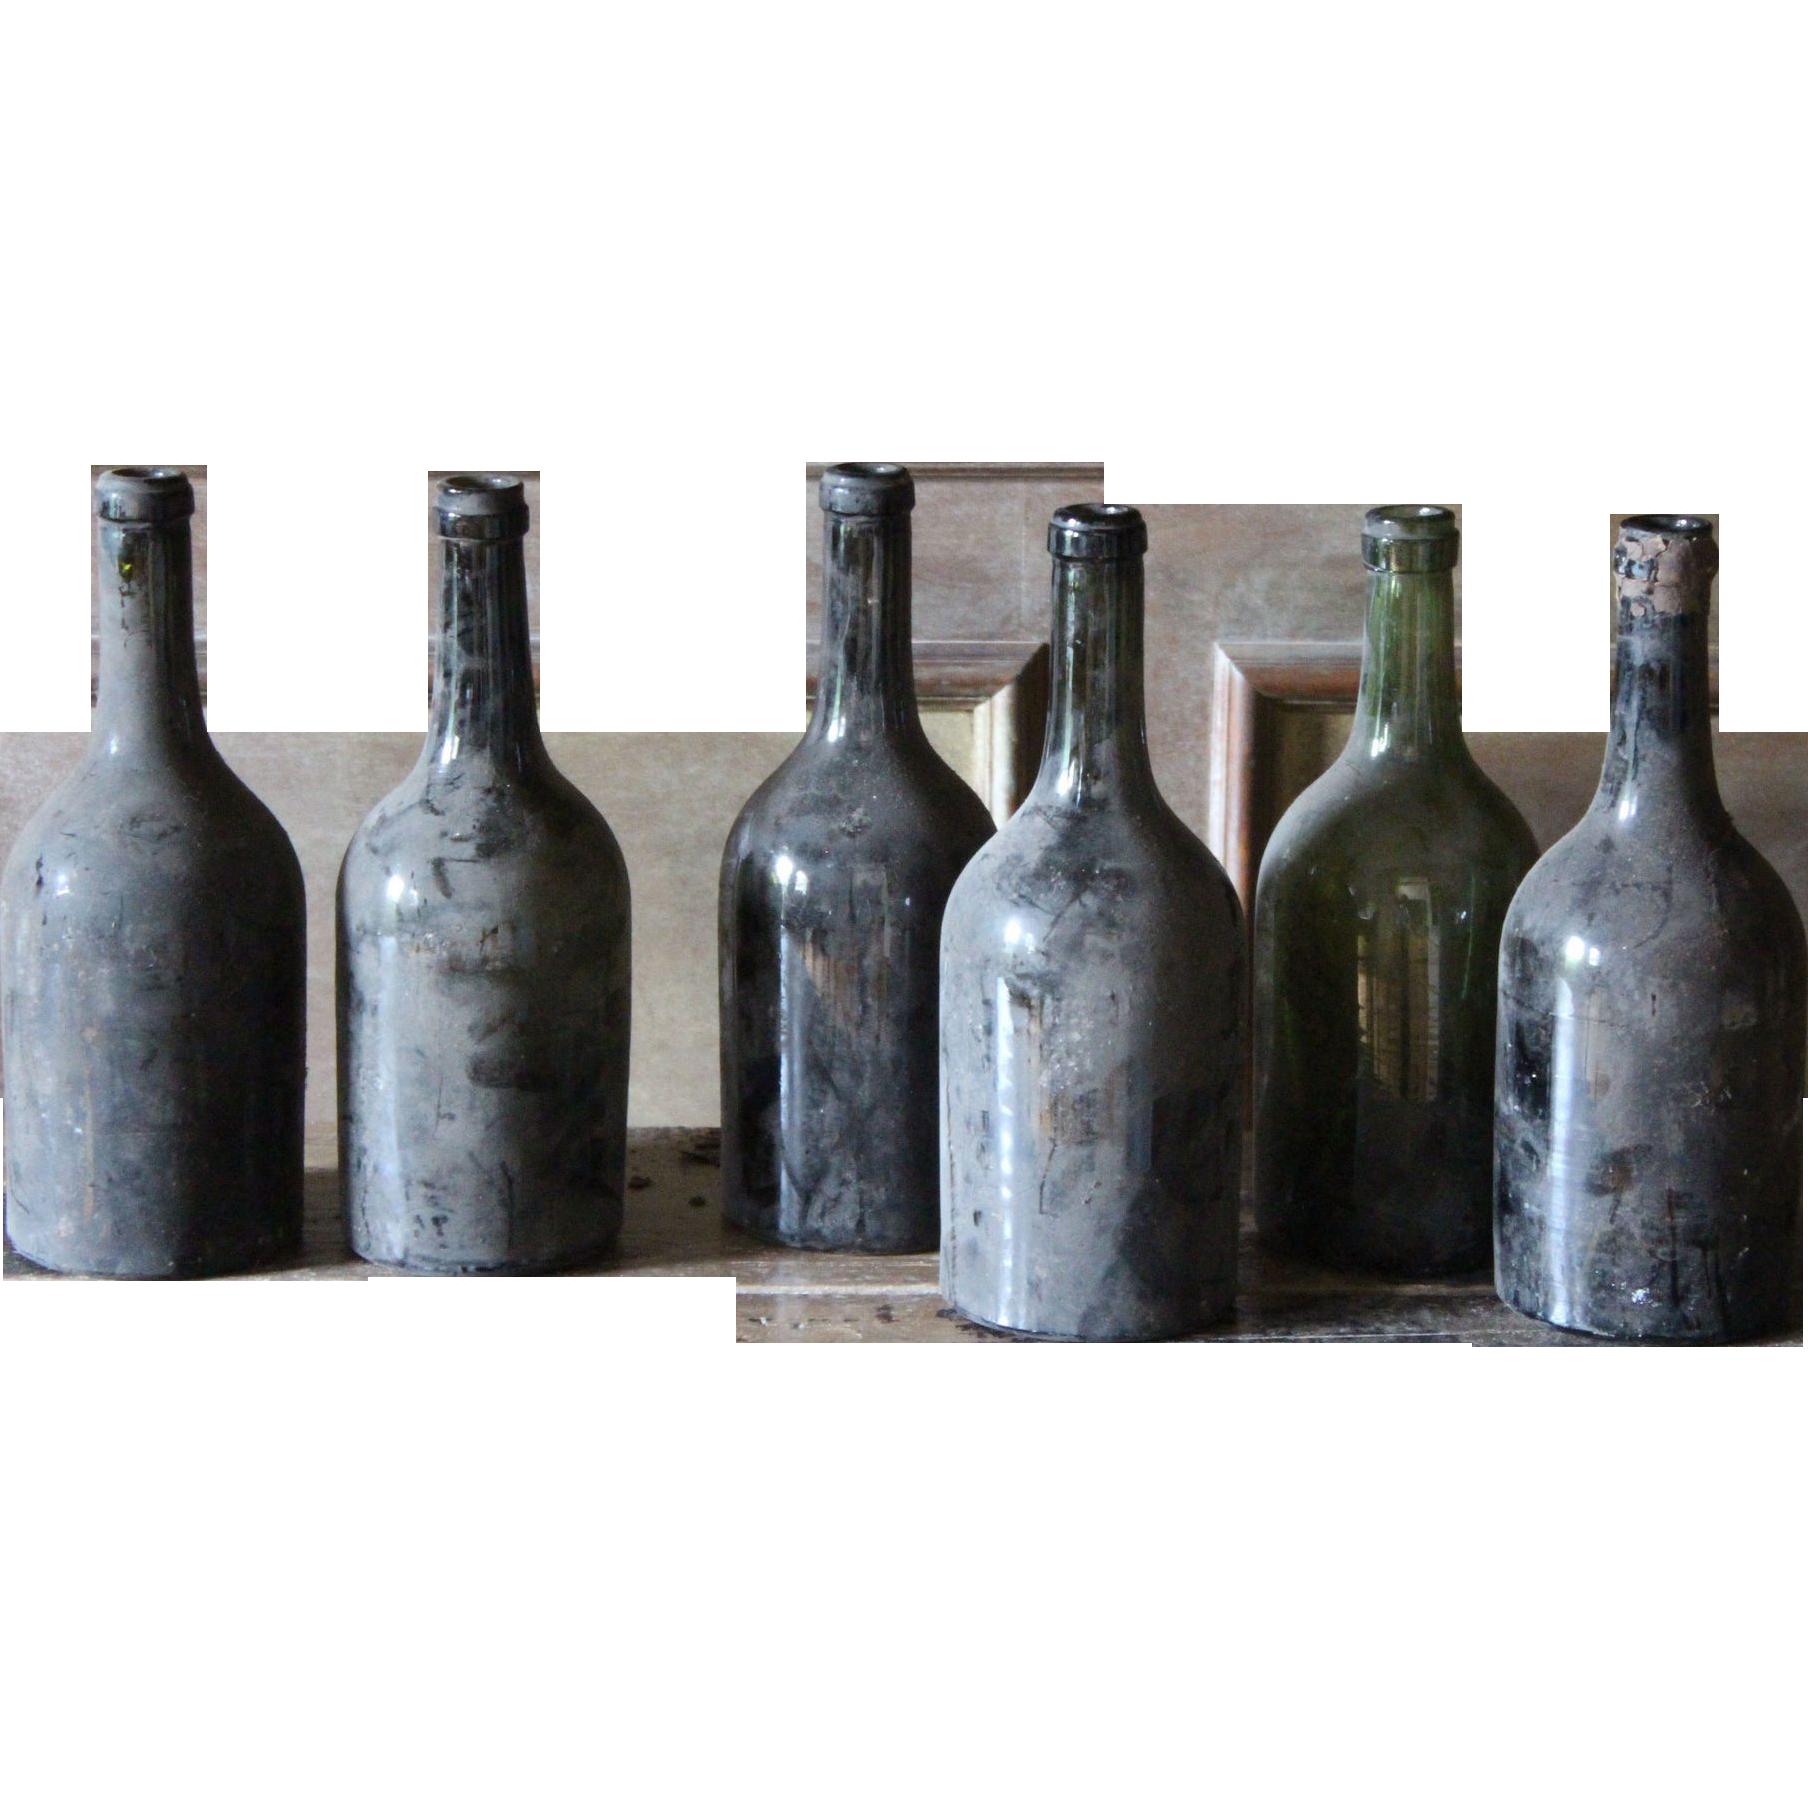 Antique french burgundy wine bottles 19th century glass for Glass bottles for wine